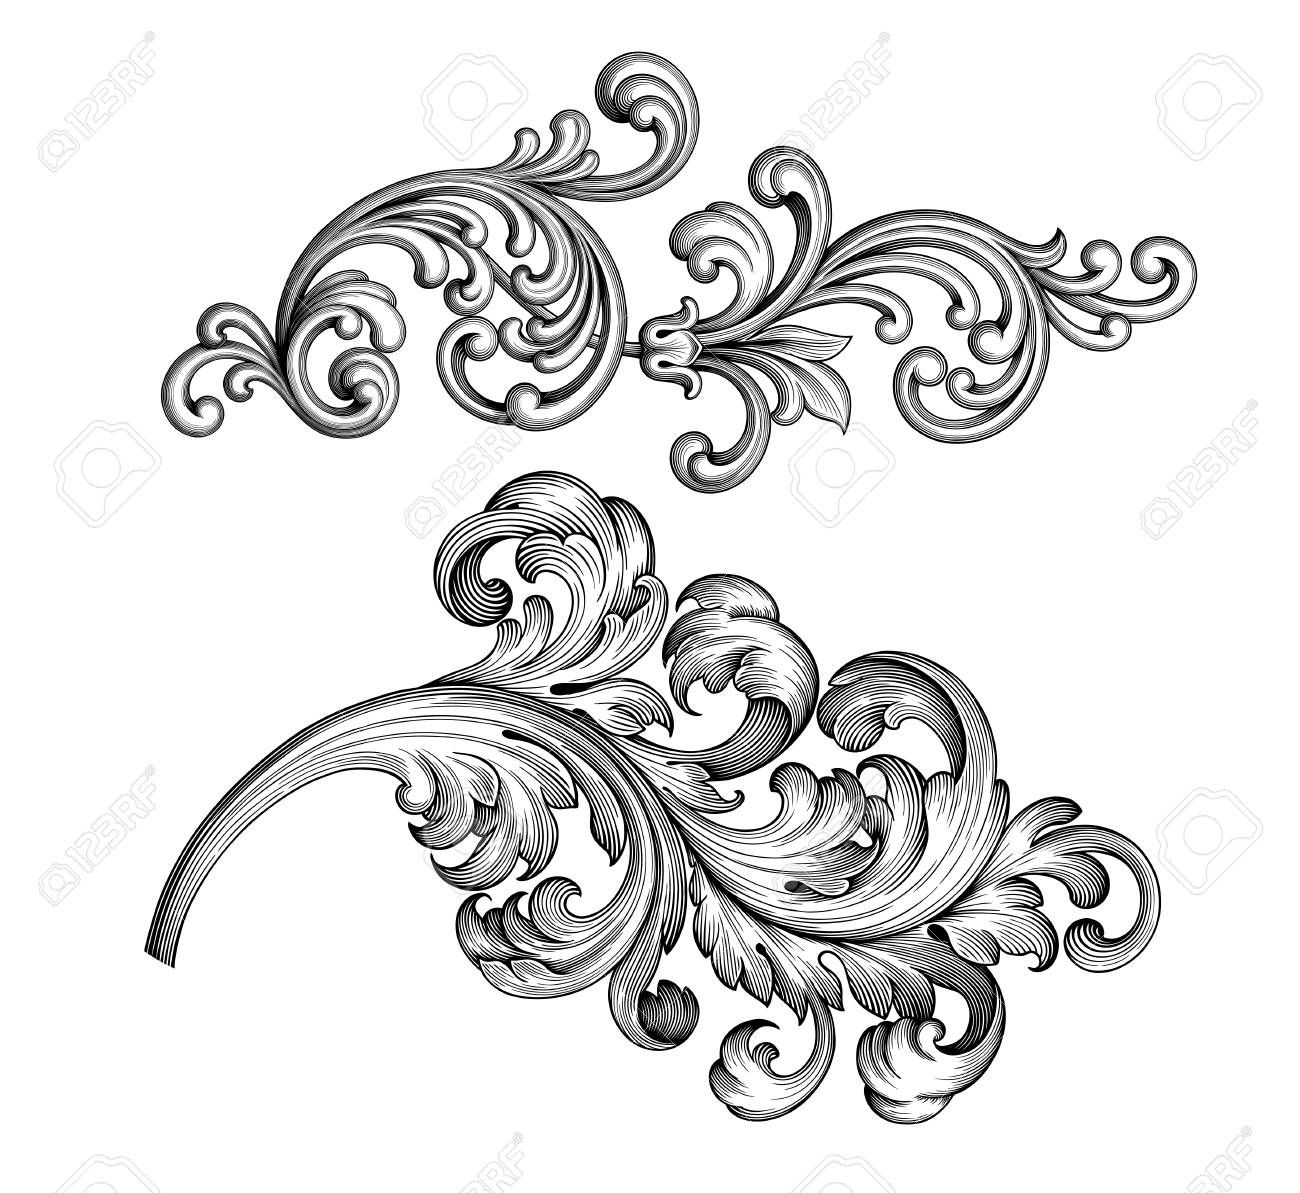 Vintage Baroque Victorian Frame Border Tattoo Floral Ornament Leaf Scroll Engraved Retro Flower Pattern Deco Vintage Frame Tattoo Framed Tattoo Filigree Tattoo